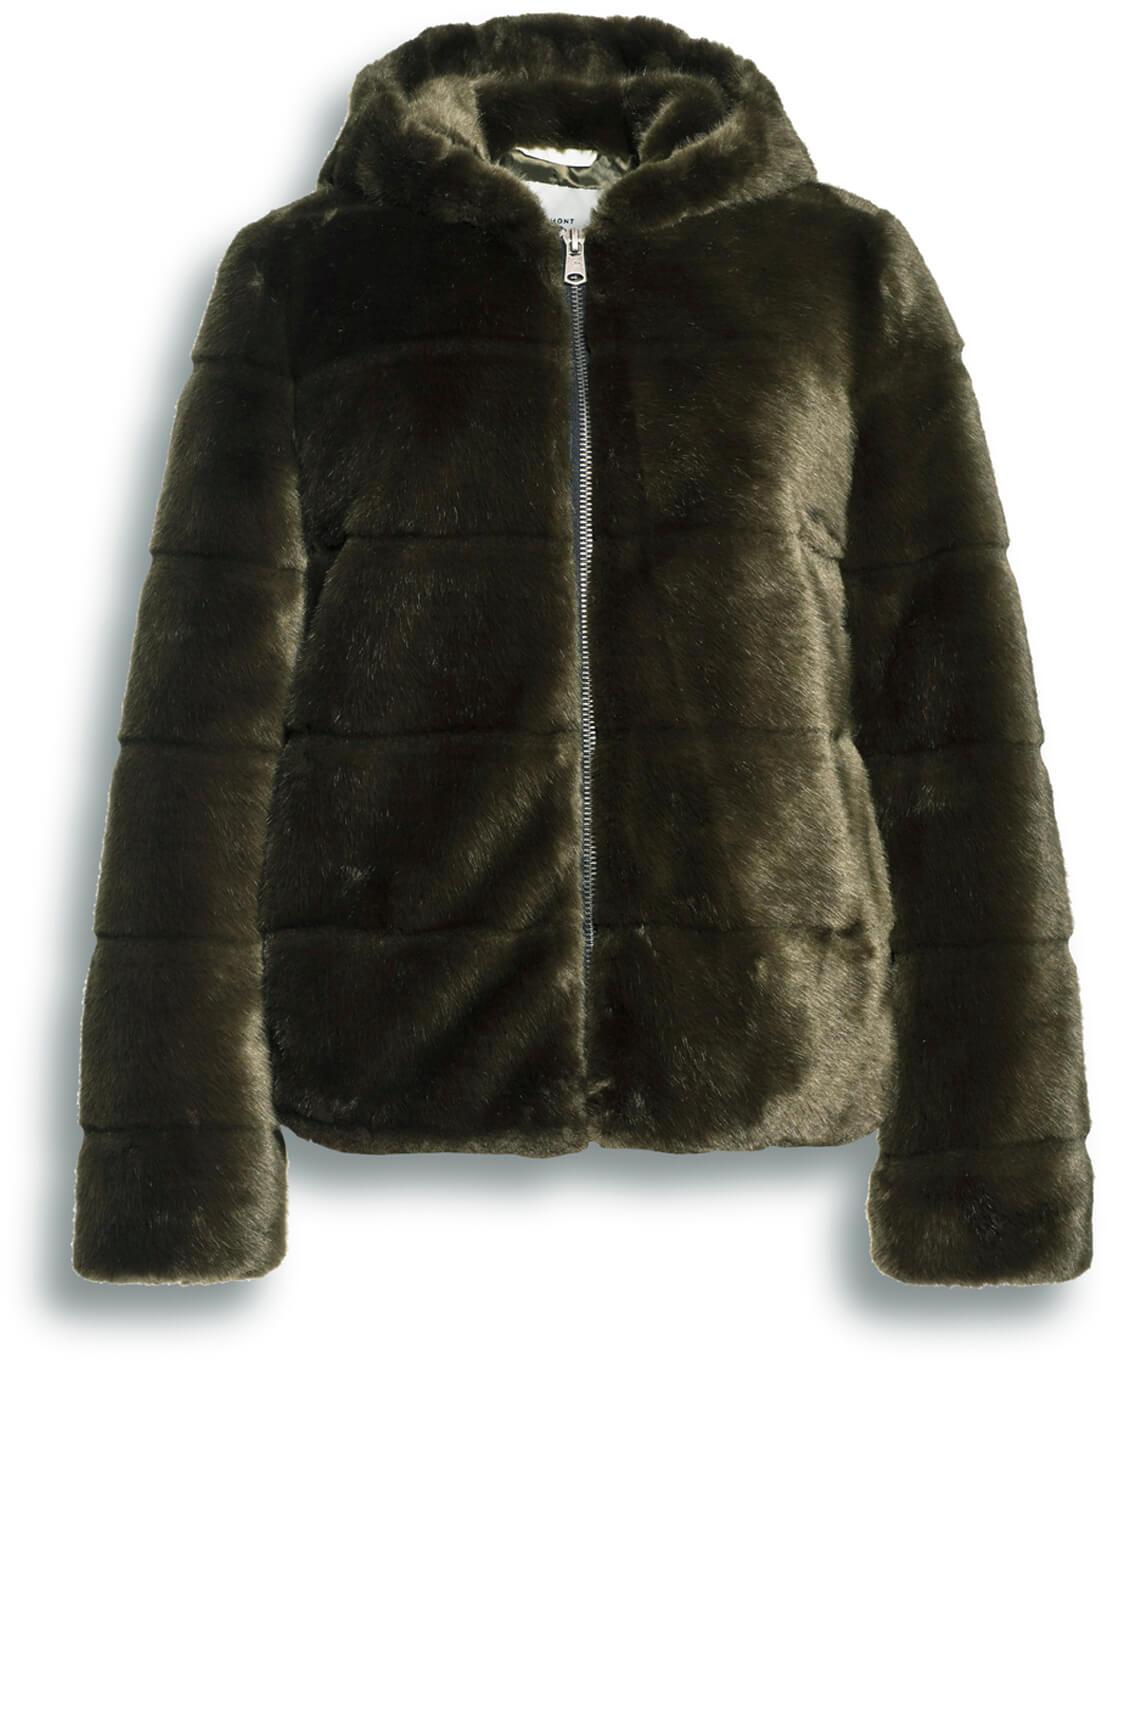 Beaumont Dames Fake fur jas groen